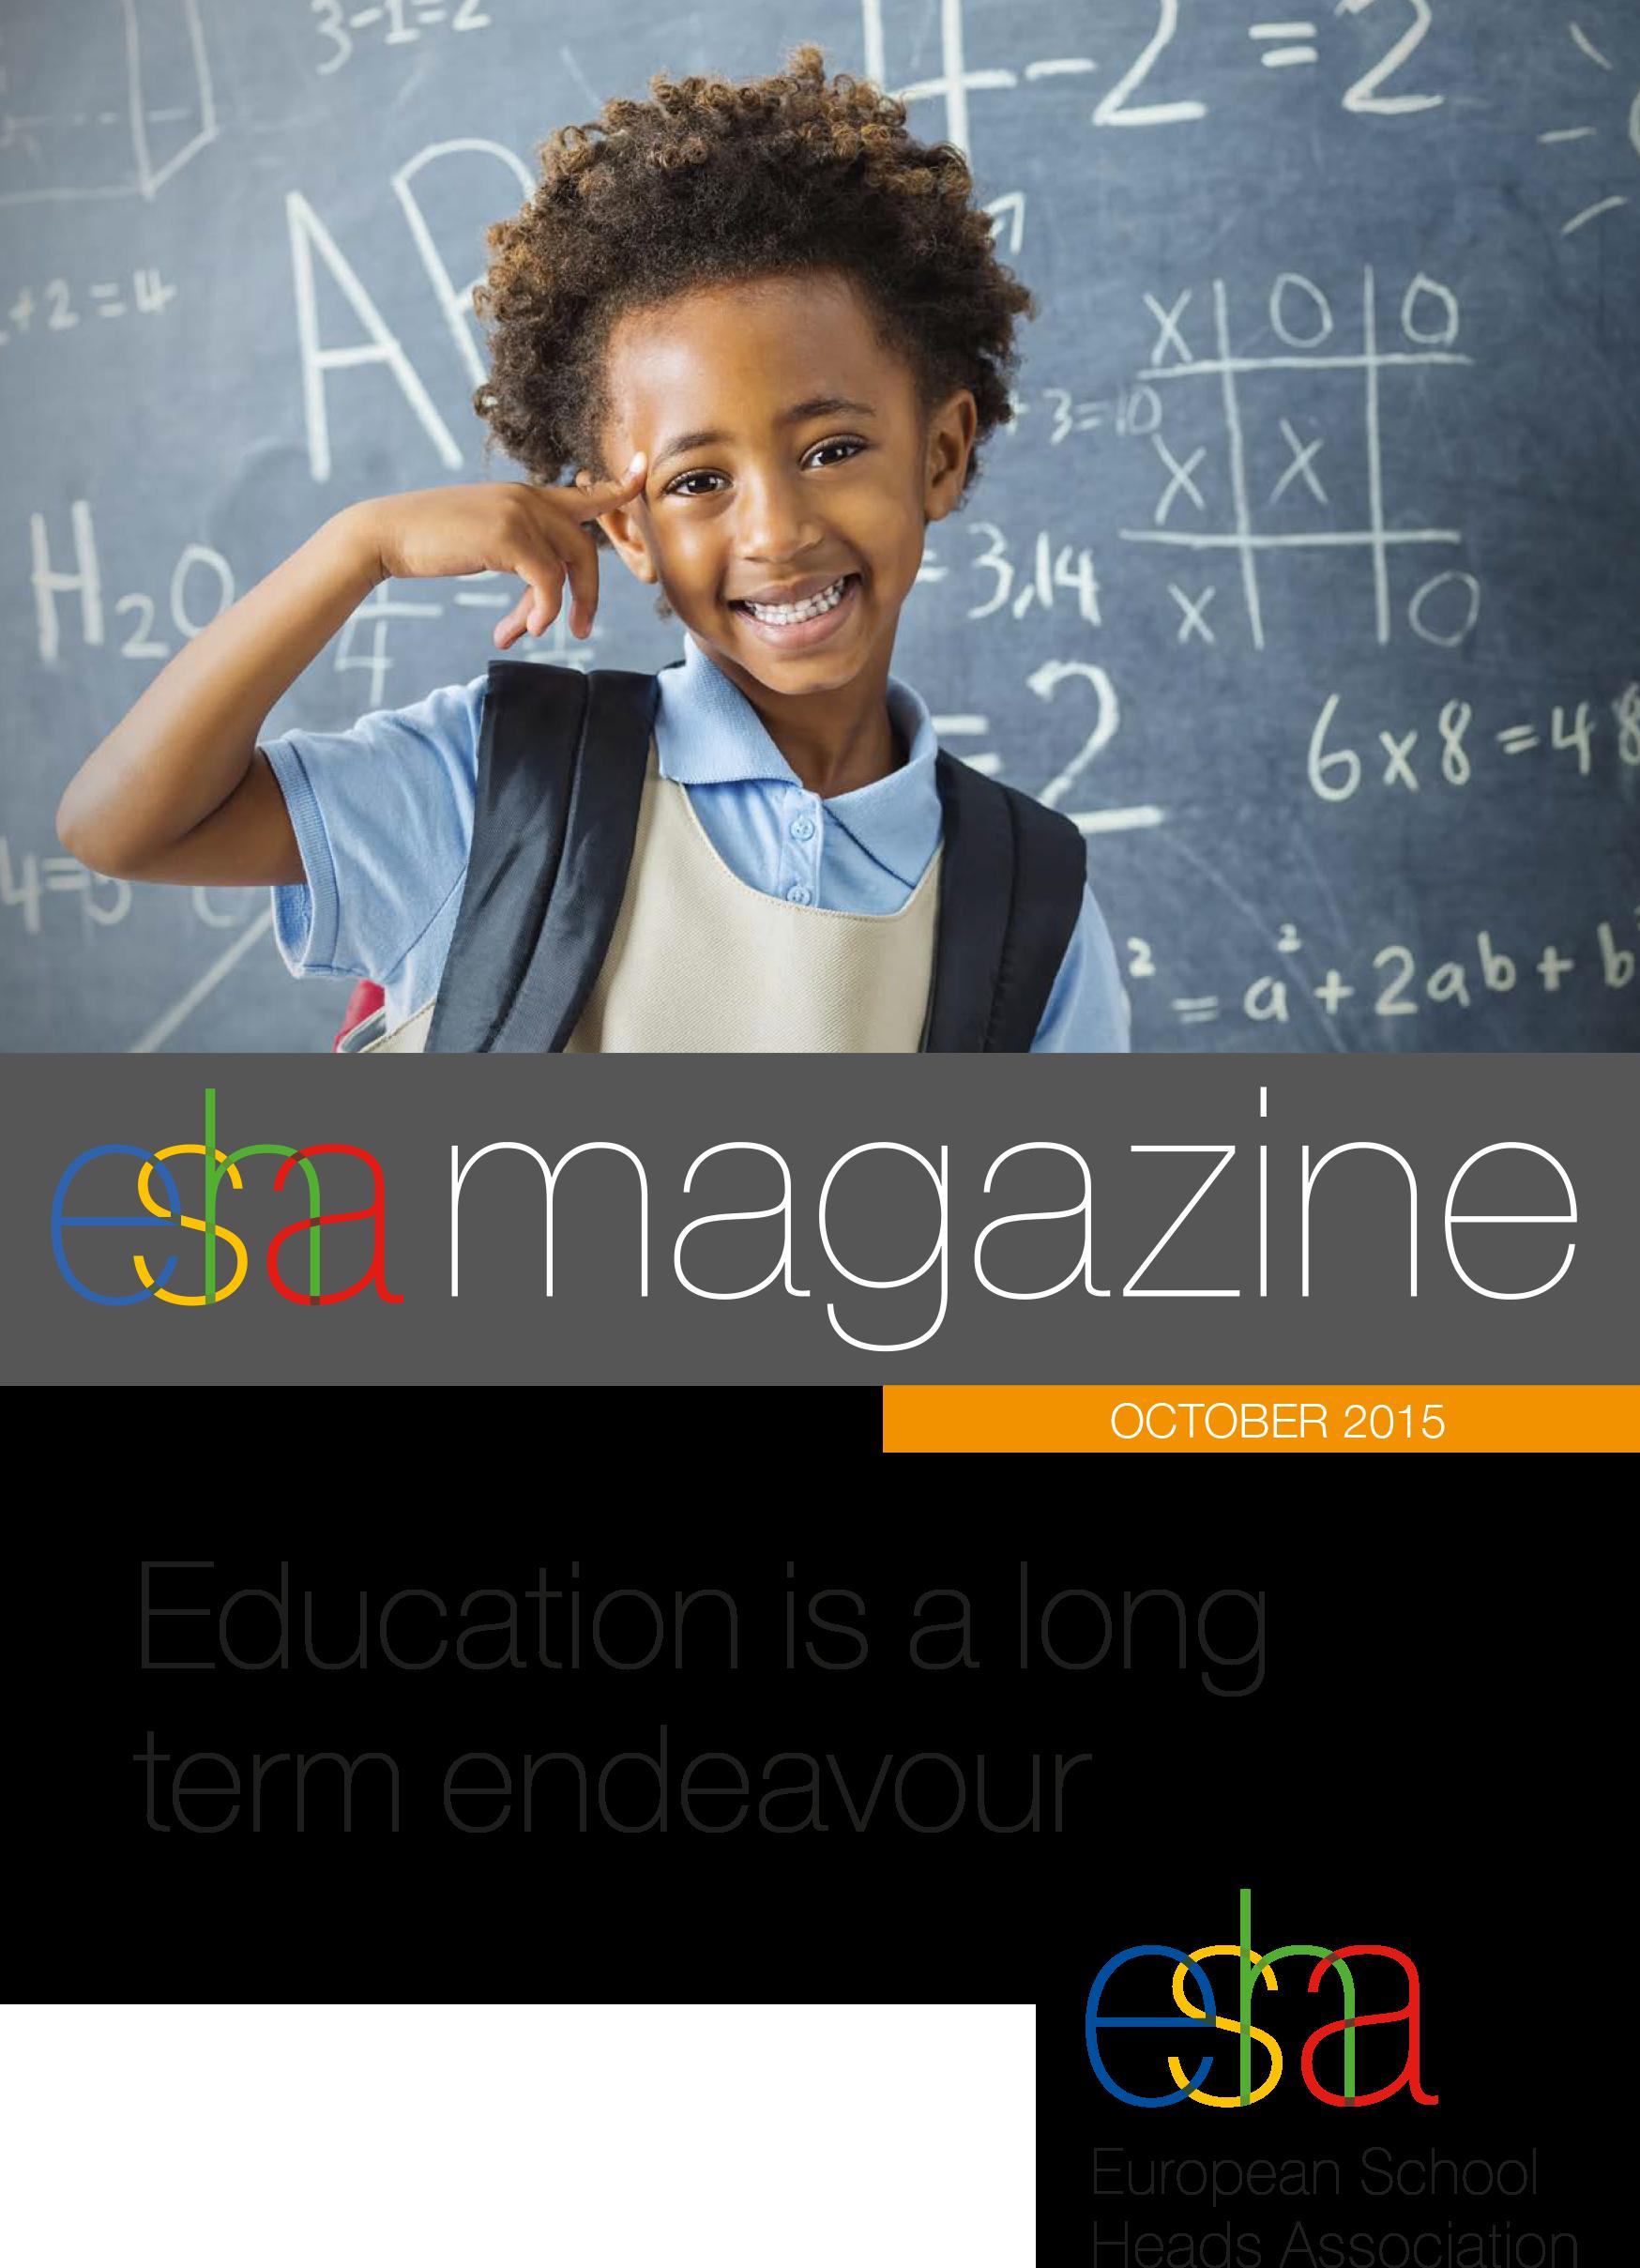 esha-magazine-october-2015-1-kopieren